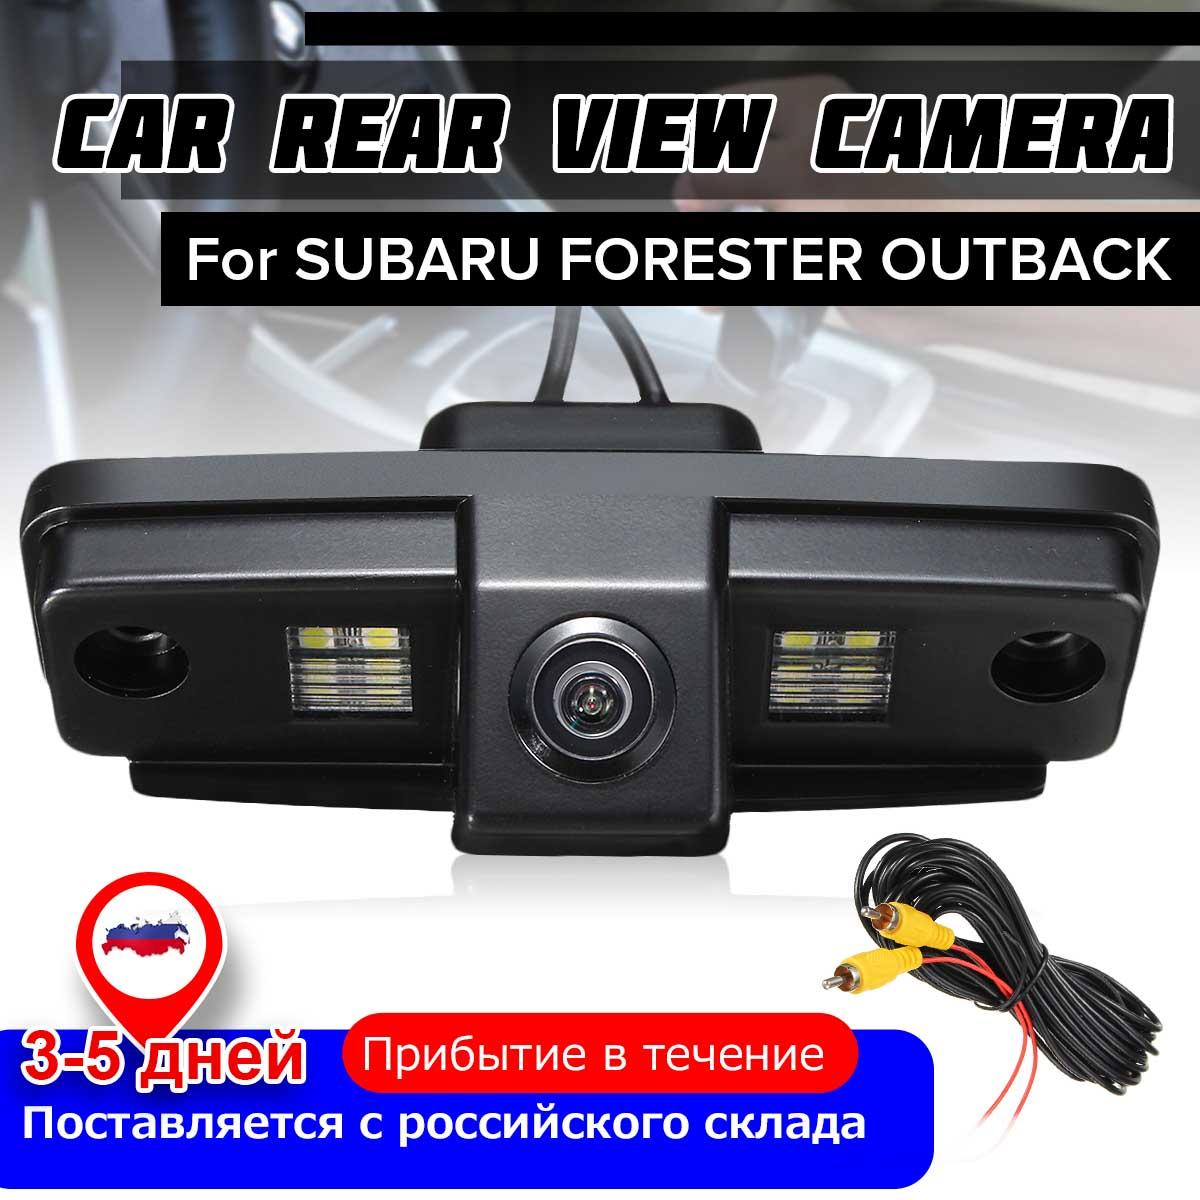 CCD Car Rear View Camera for Subaru Forester Outback Impreza Sedan 2008-2012